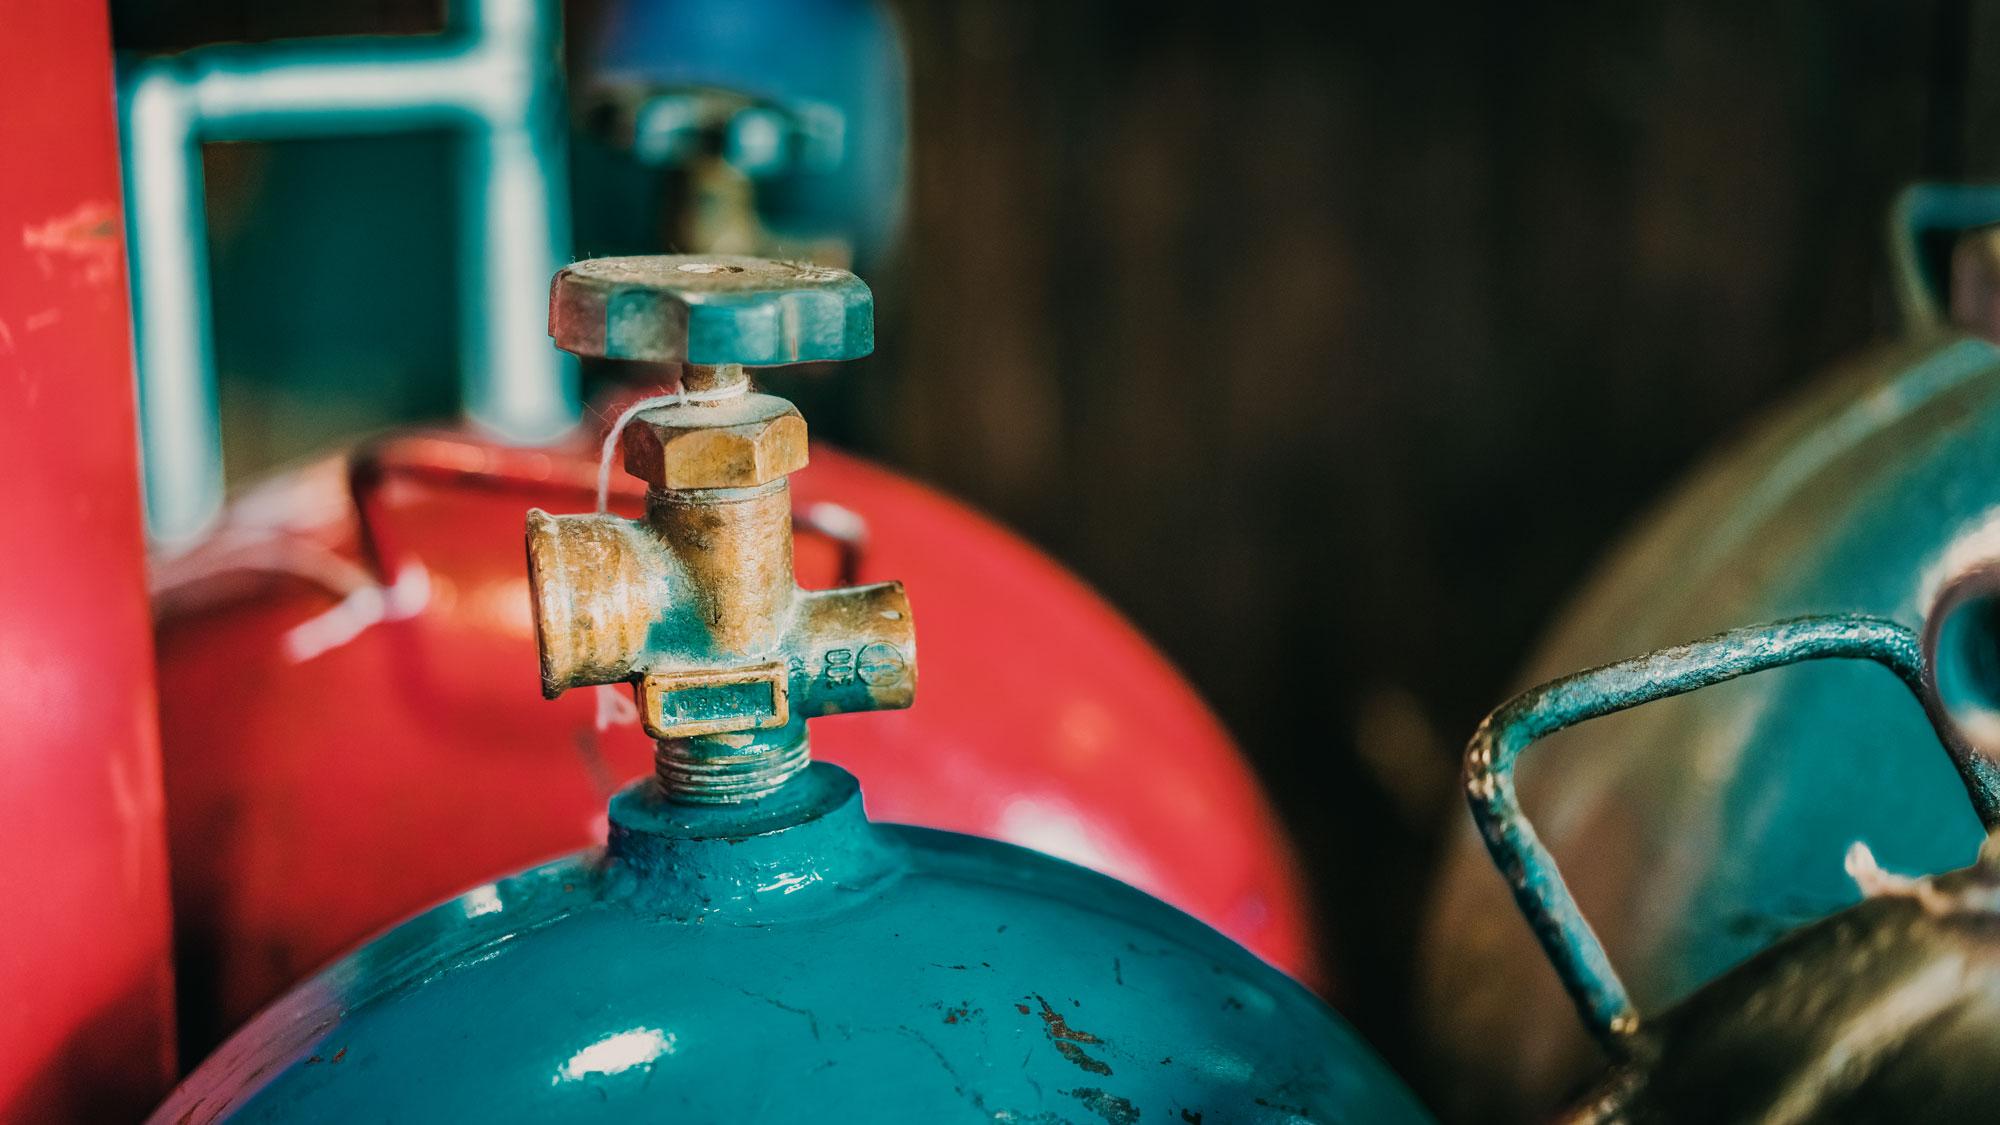 Sunrise Gases Bahadurgarh, Haryana   Industrial & Medical Gases in India